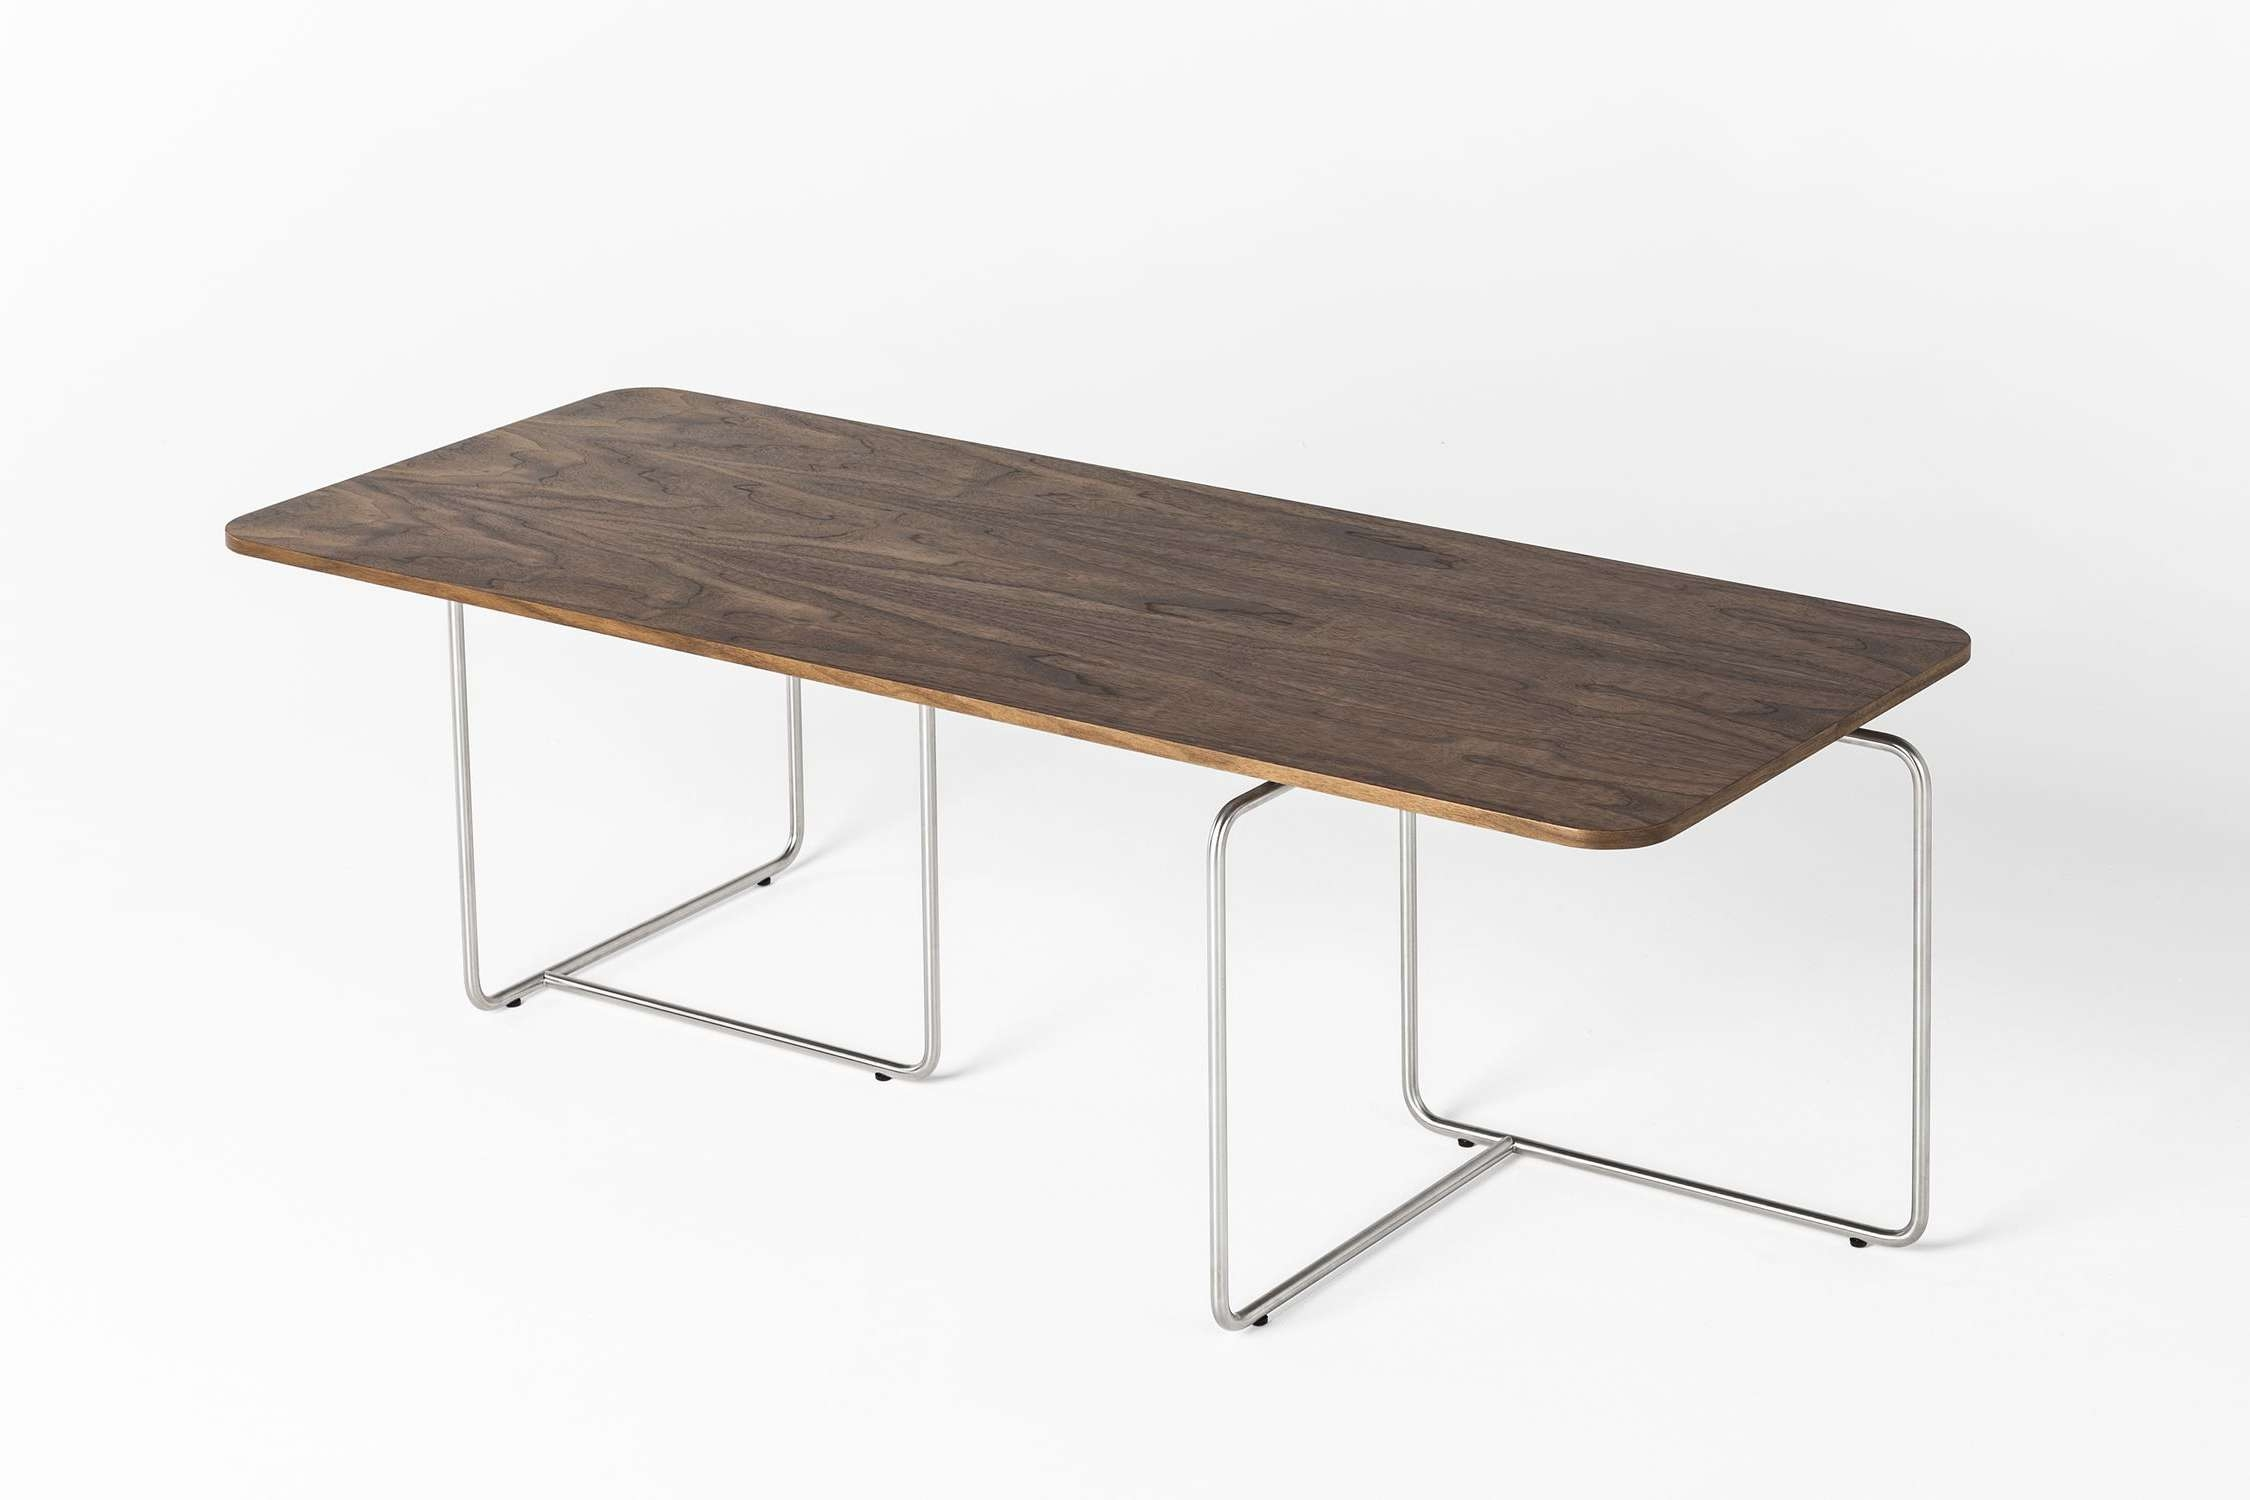 Contemporary Coffee Table / Oak / Wood Veneer / Rectangular Throughout Most Recent Oak Veneer Coffee Tables (View 4 of 20)